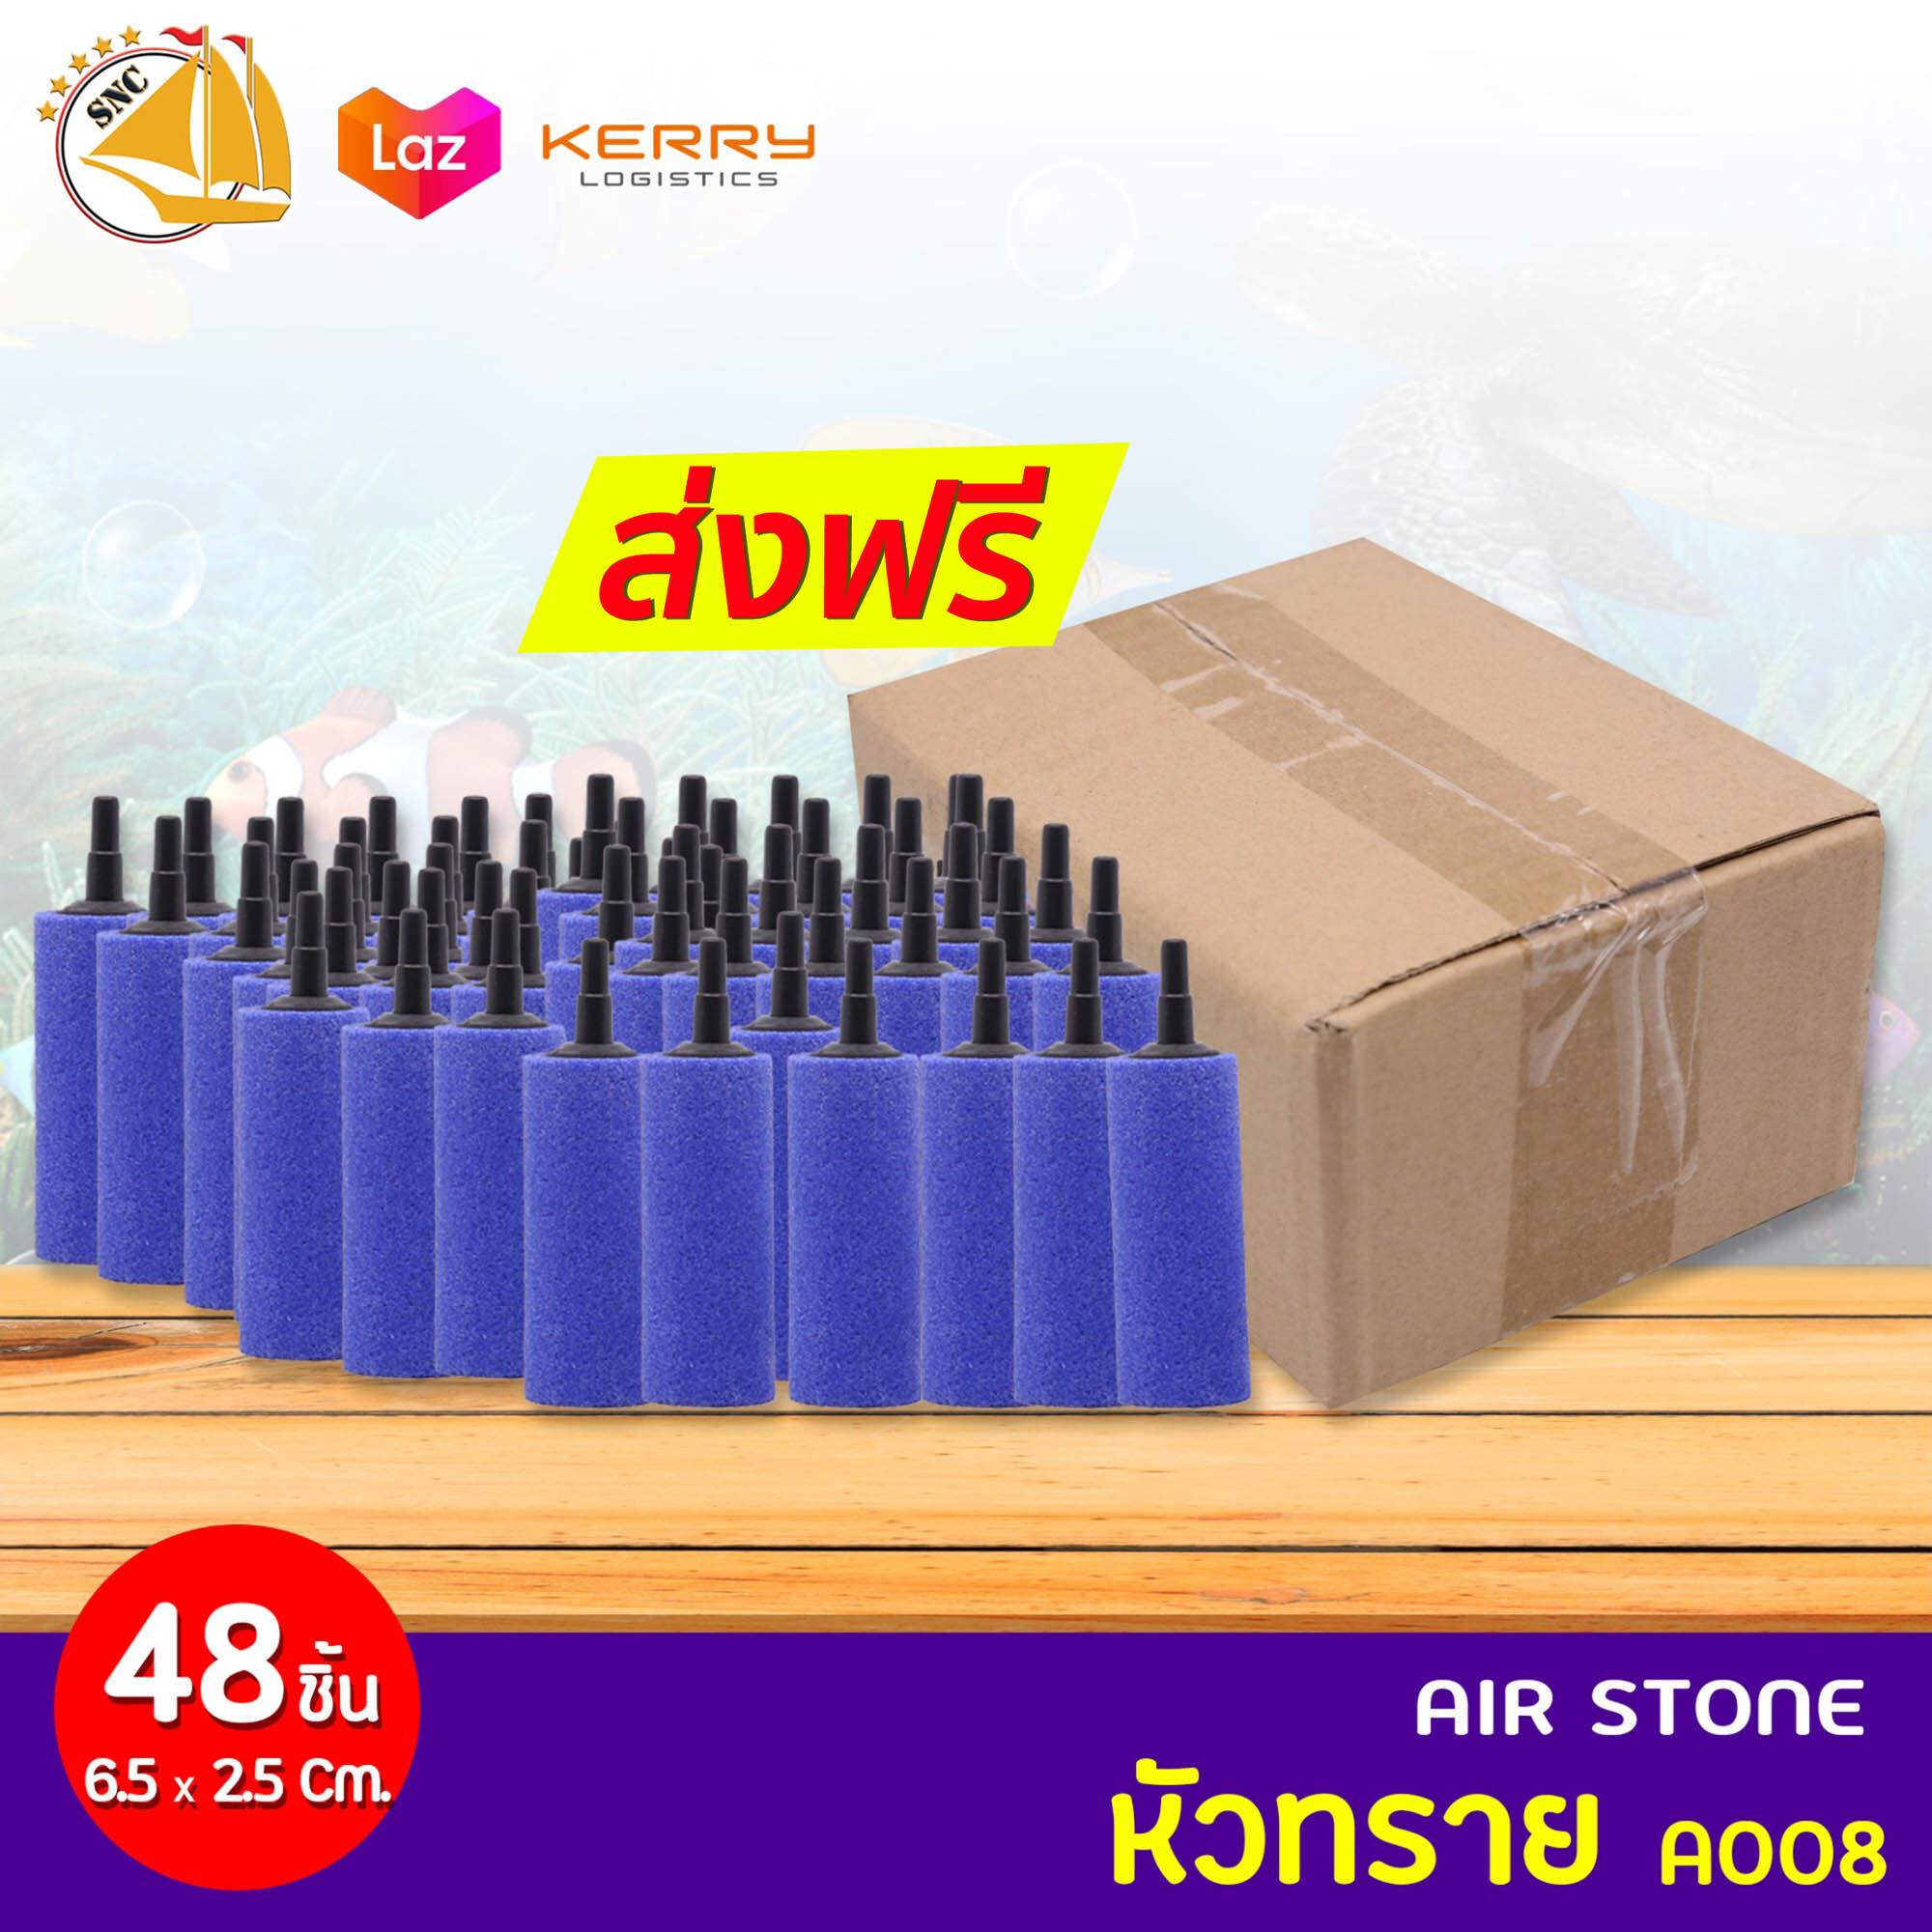 Air Stone A008 หัวทรายต่อปั้มออกซิเจน ปั๊มลม 6.5x2.5cm 1กล่อง / 48 ชิ้น